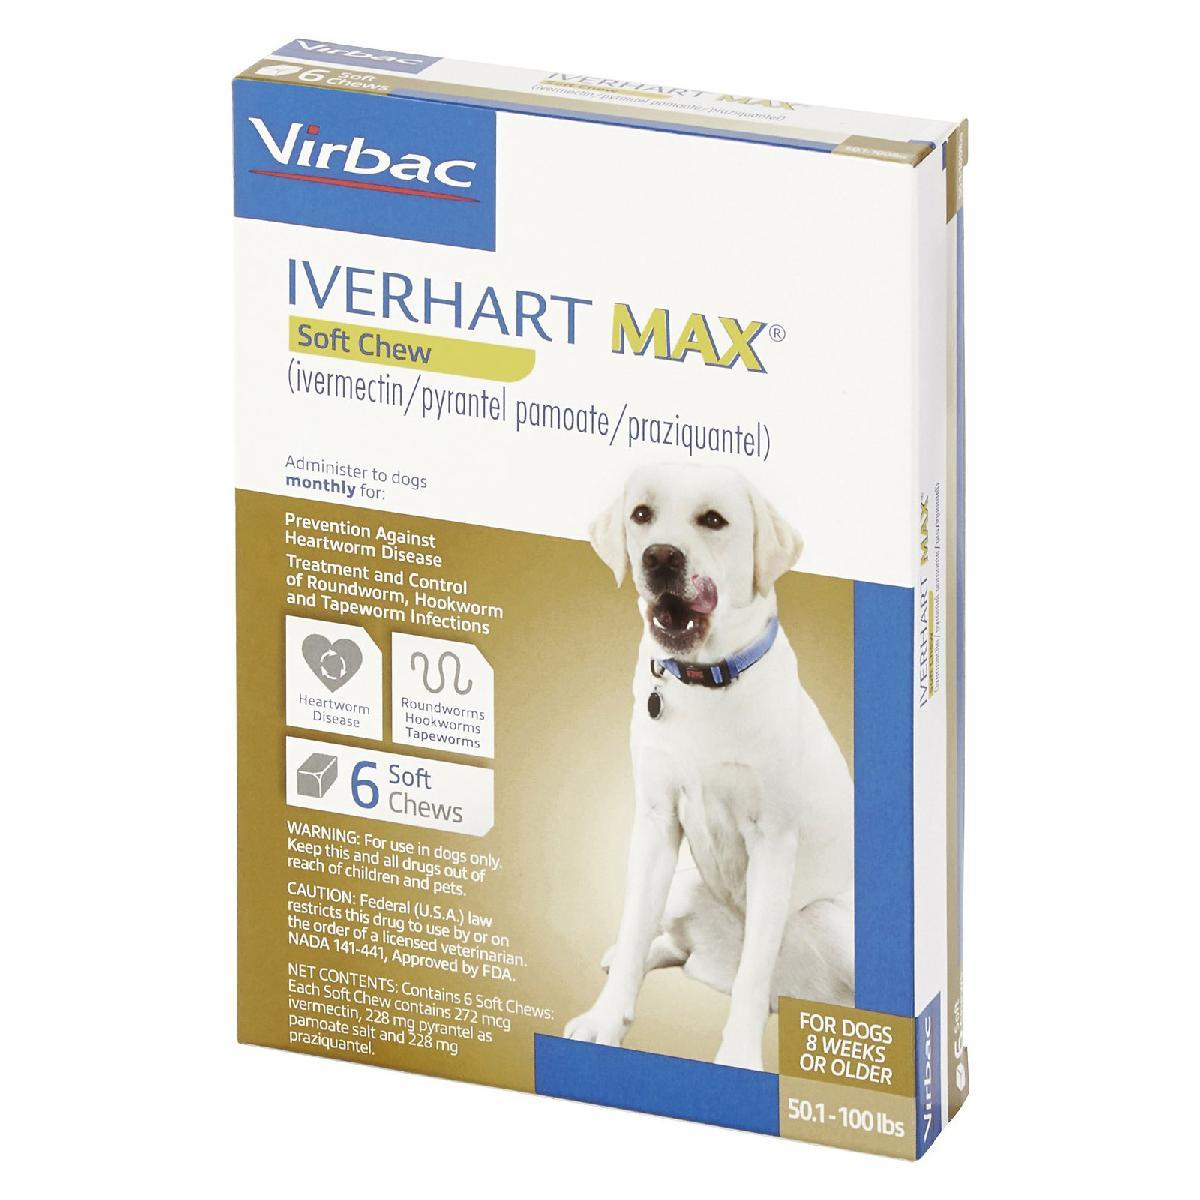 Iverhart Max (ivermectin/pyrantel pamoate/praziquantel ...